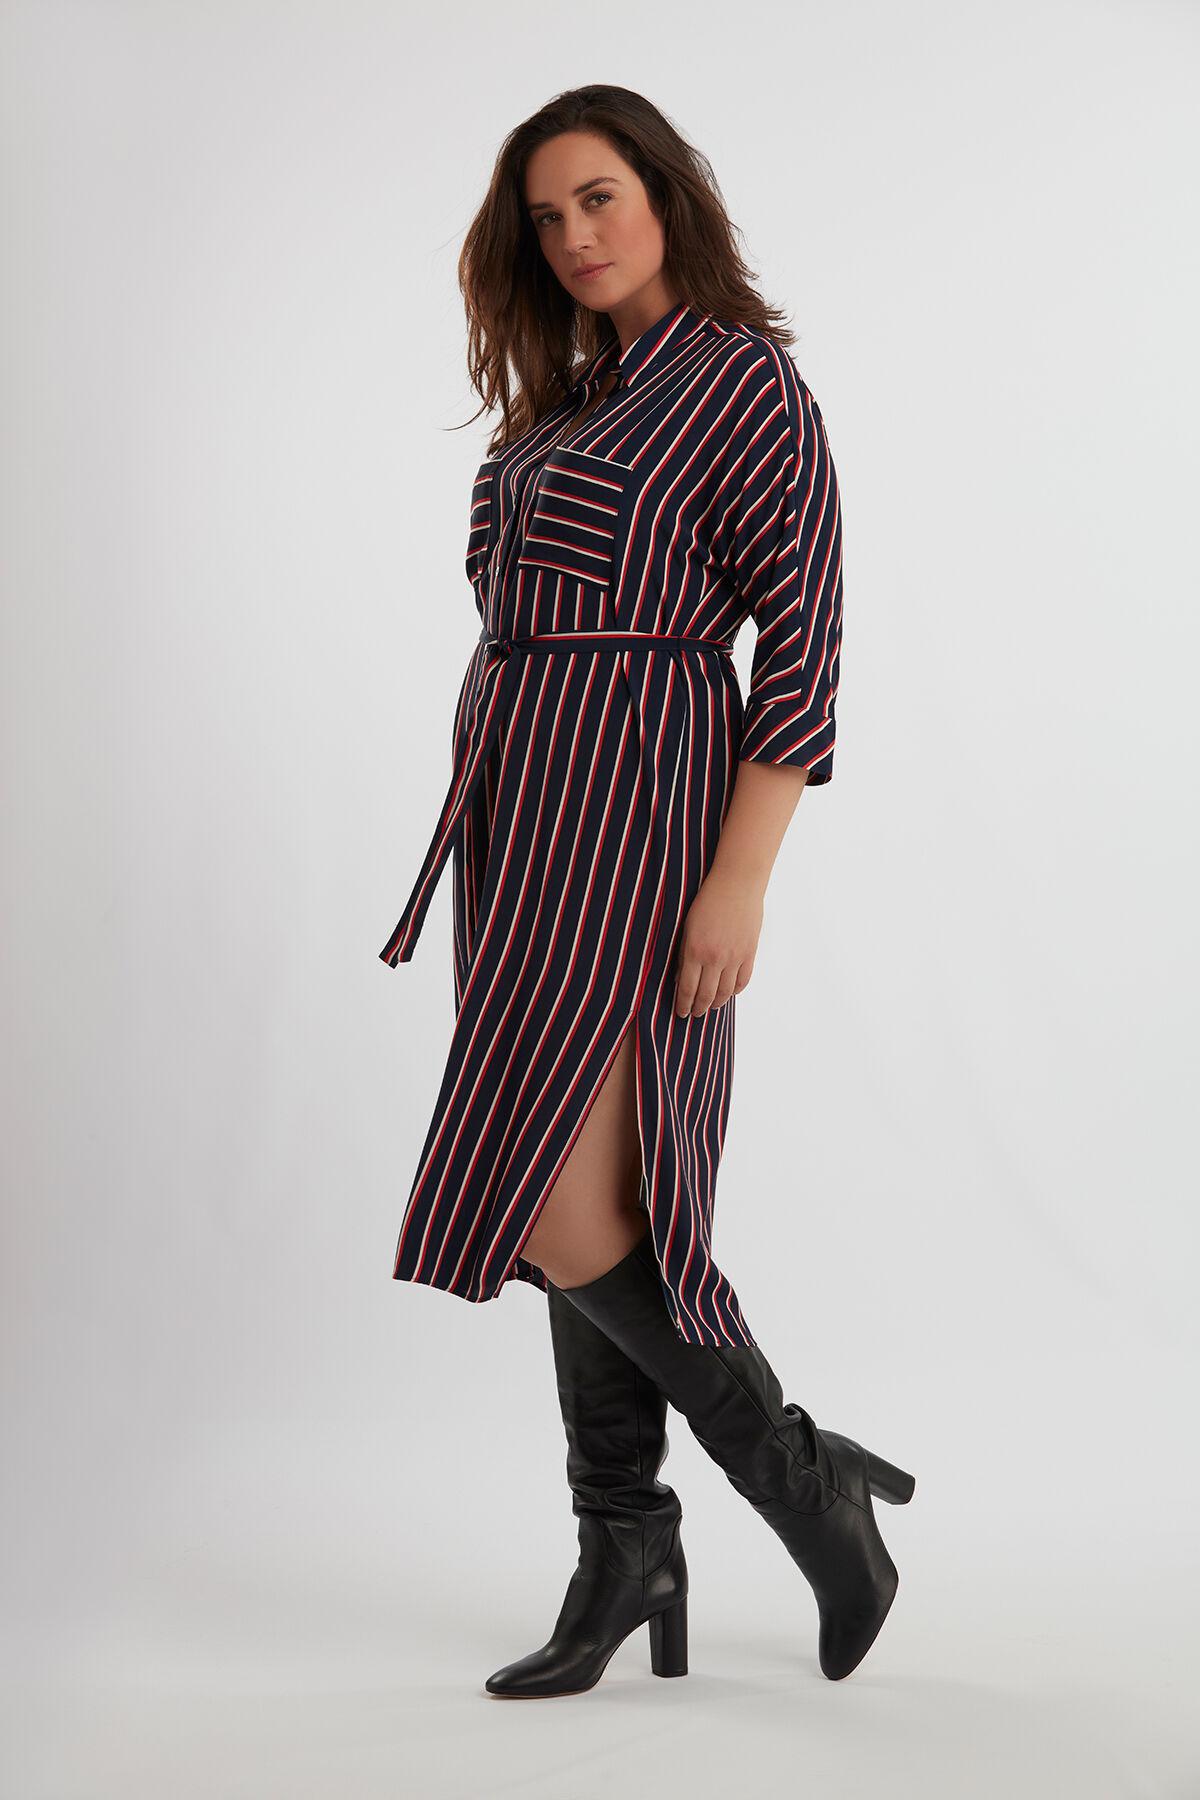 Pronto moda vestidos fiesta